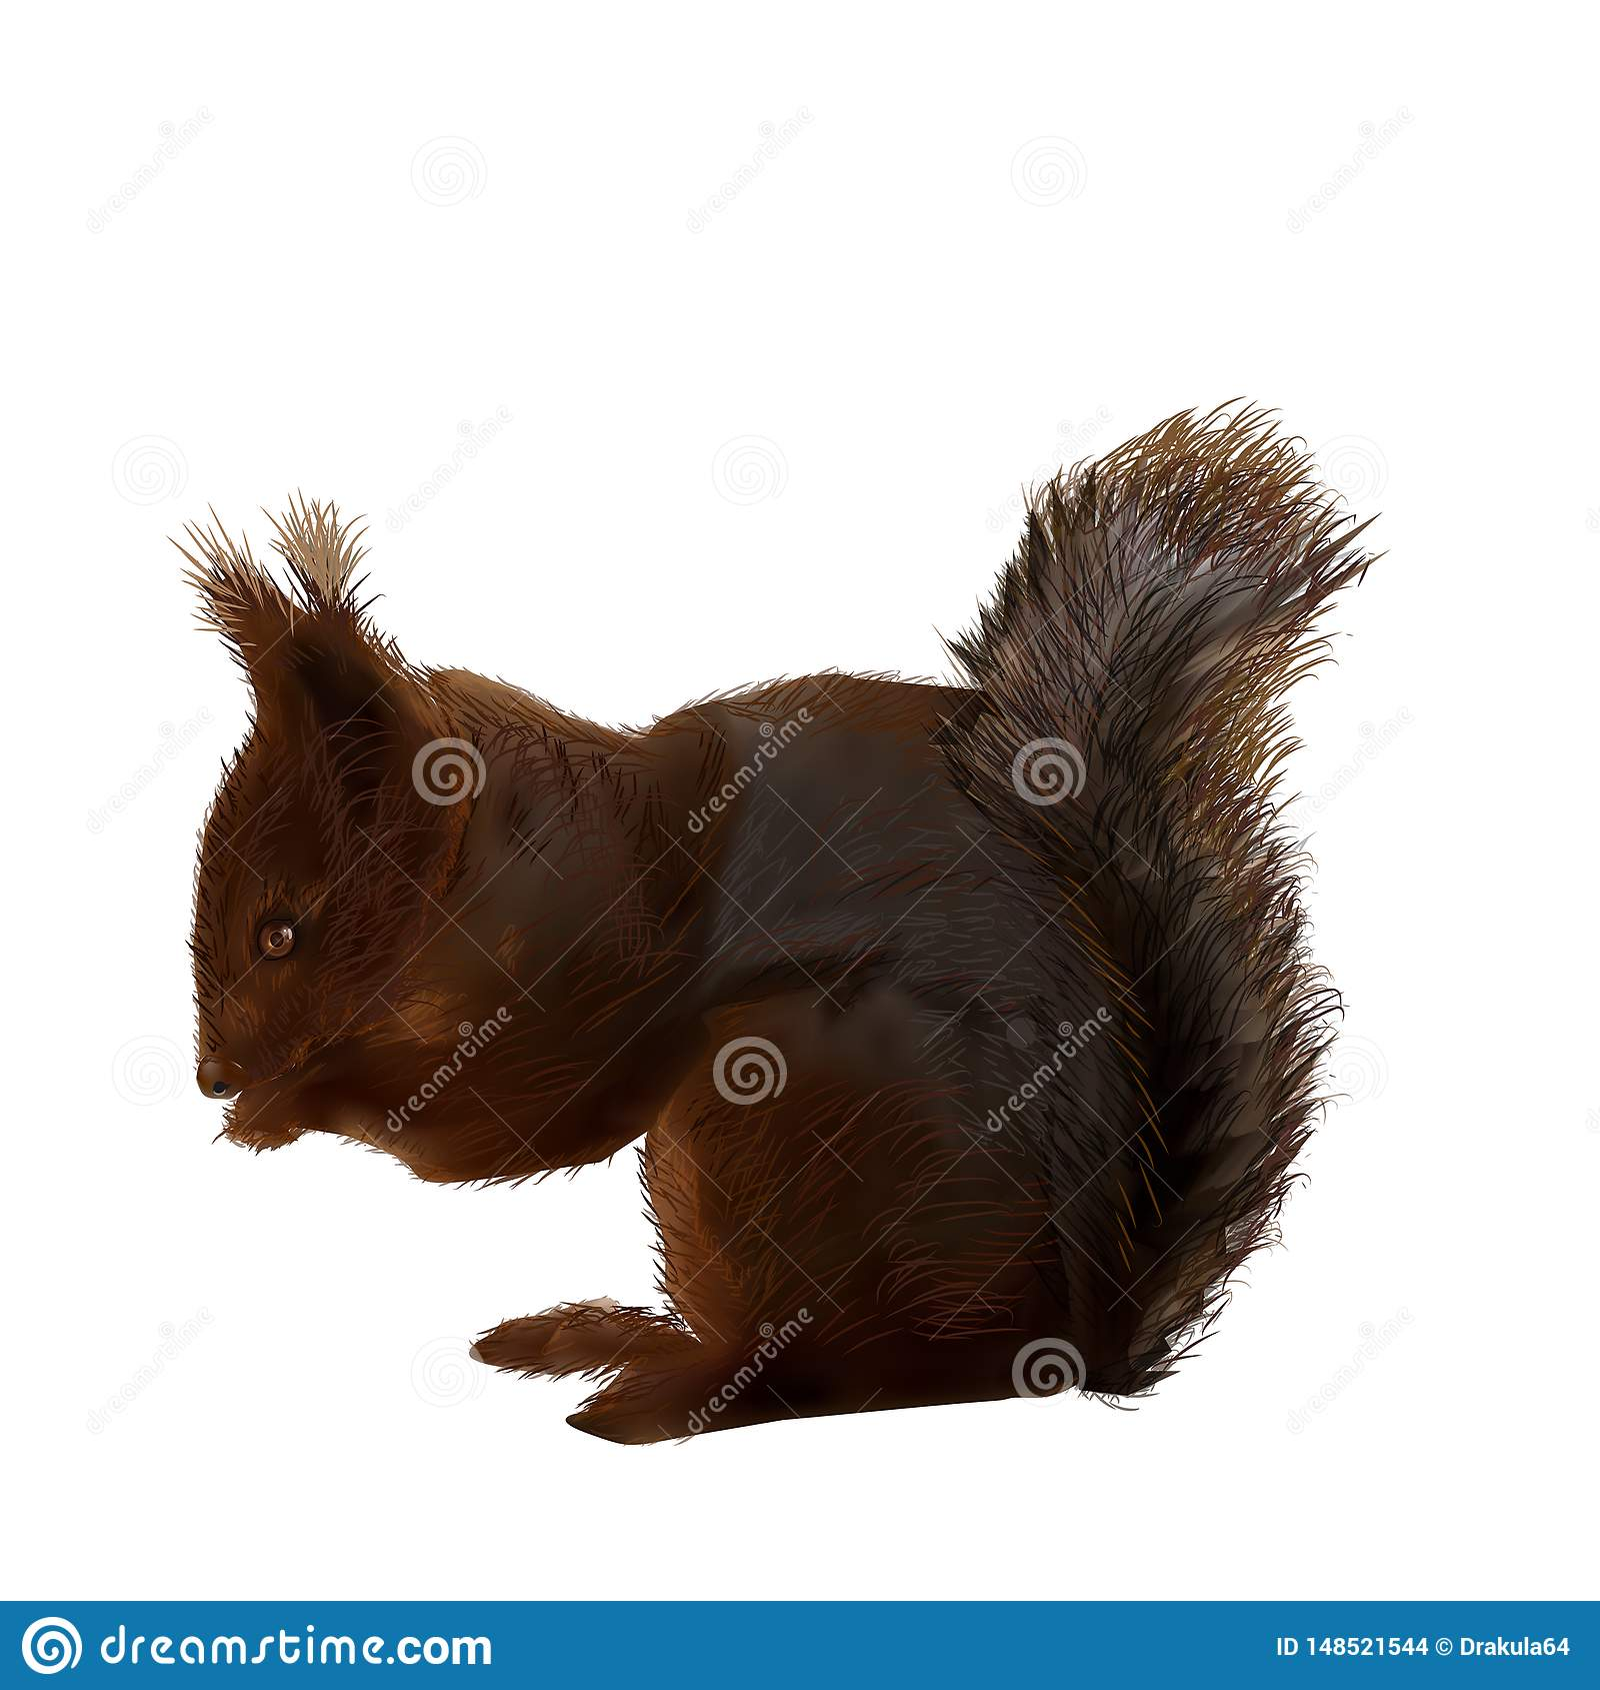 Vector-illustration-of-a-squirrel